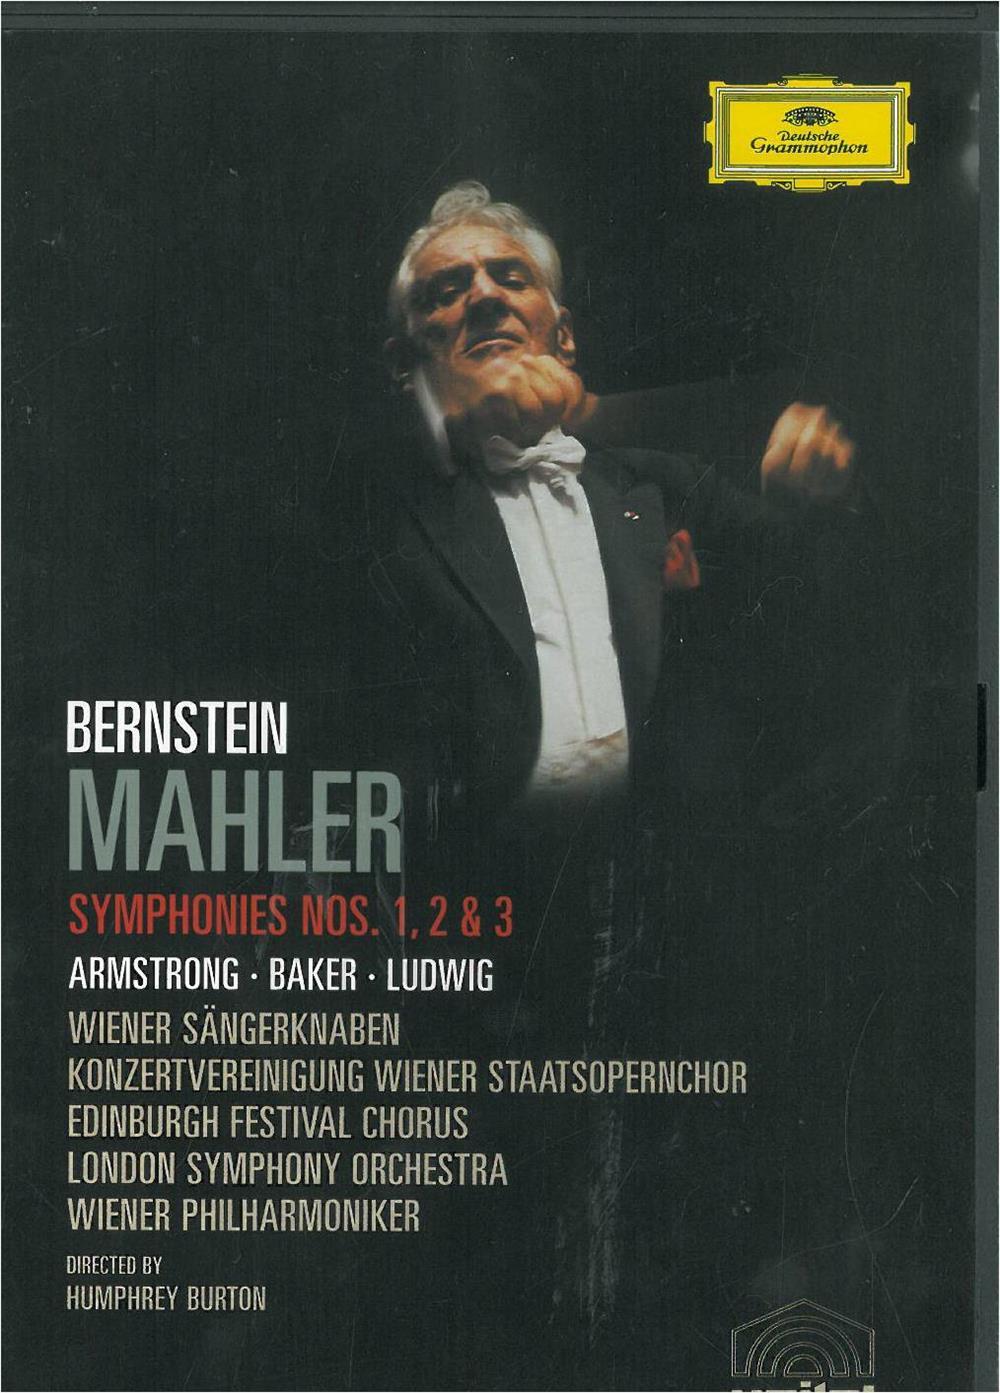 Mahler _symphonies 1,2,3_DVD som.jpg